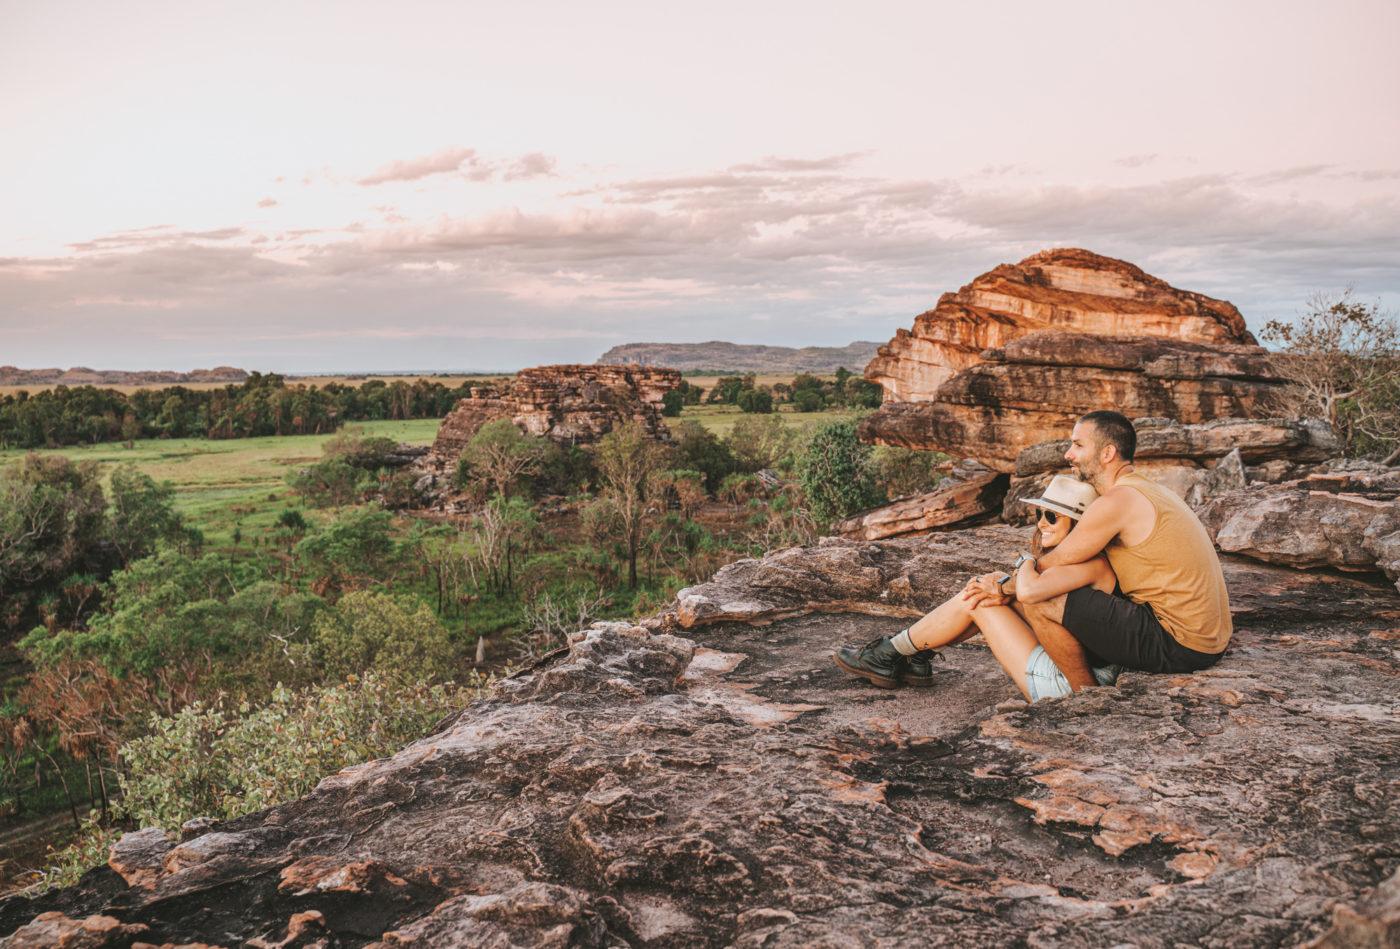 Sunset at Ubirr, Kakadu National Park